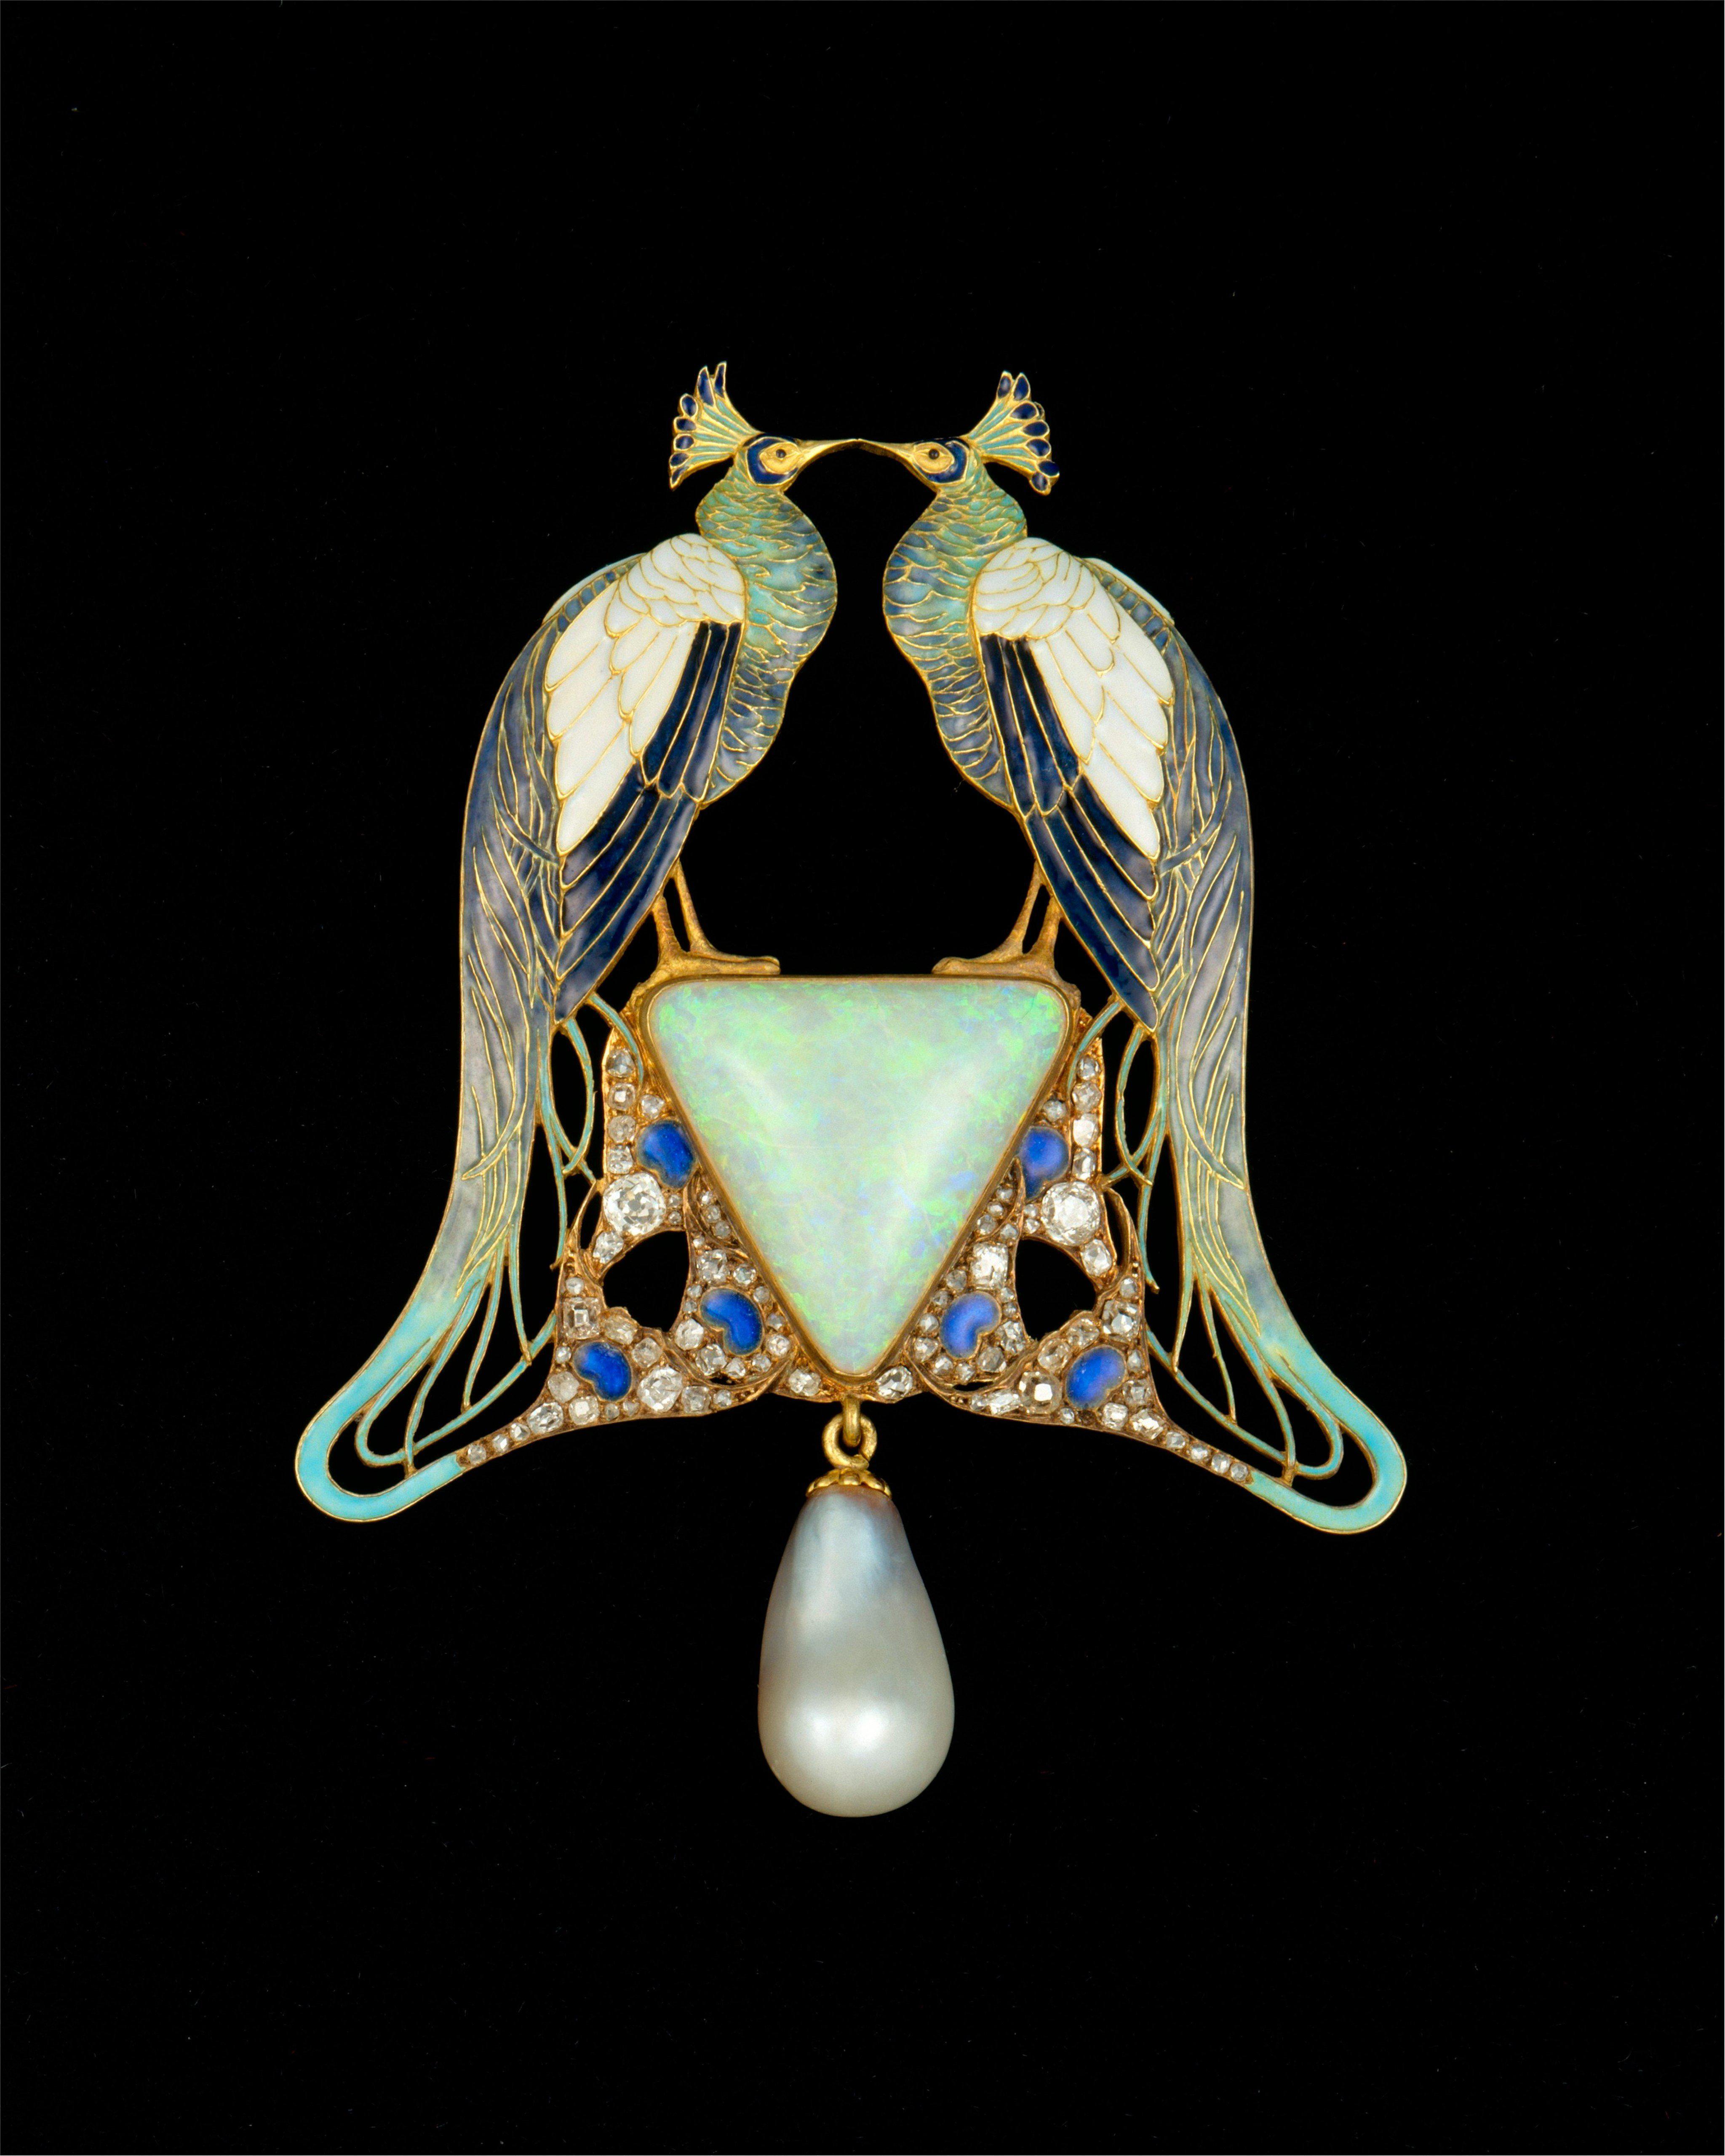 Pendant. Artist: Rene-Jules Lalique (French, AA¿ 1860-1945 Paris); Date: ca. 1901; Culture: French, Paris; Medium: Gold, enamel, opal, pearl,